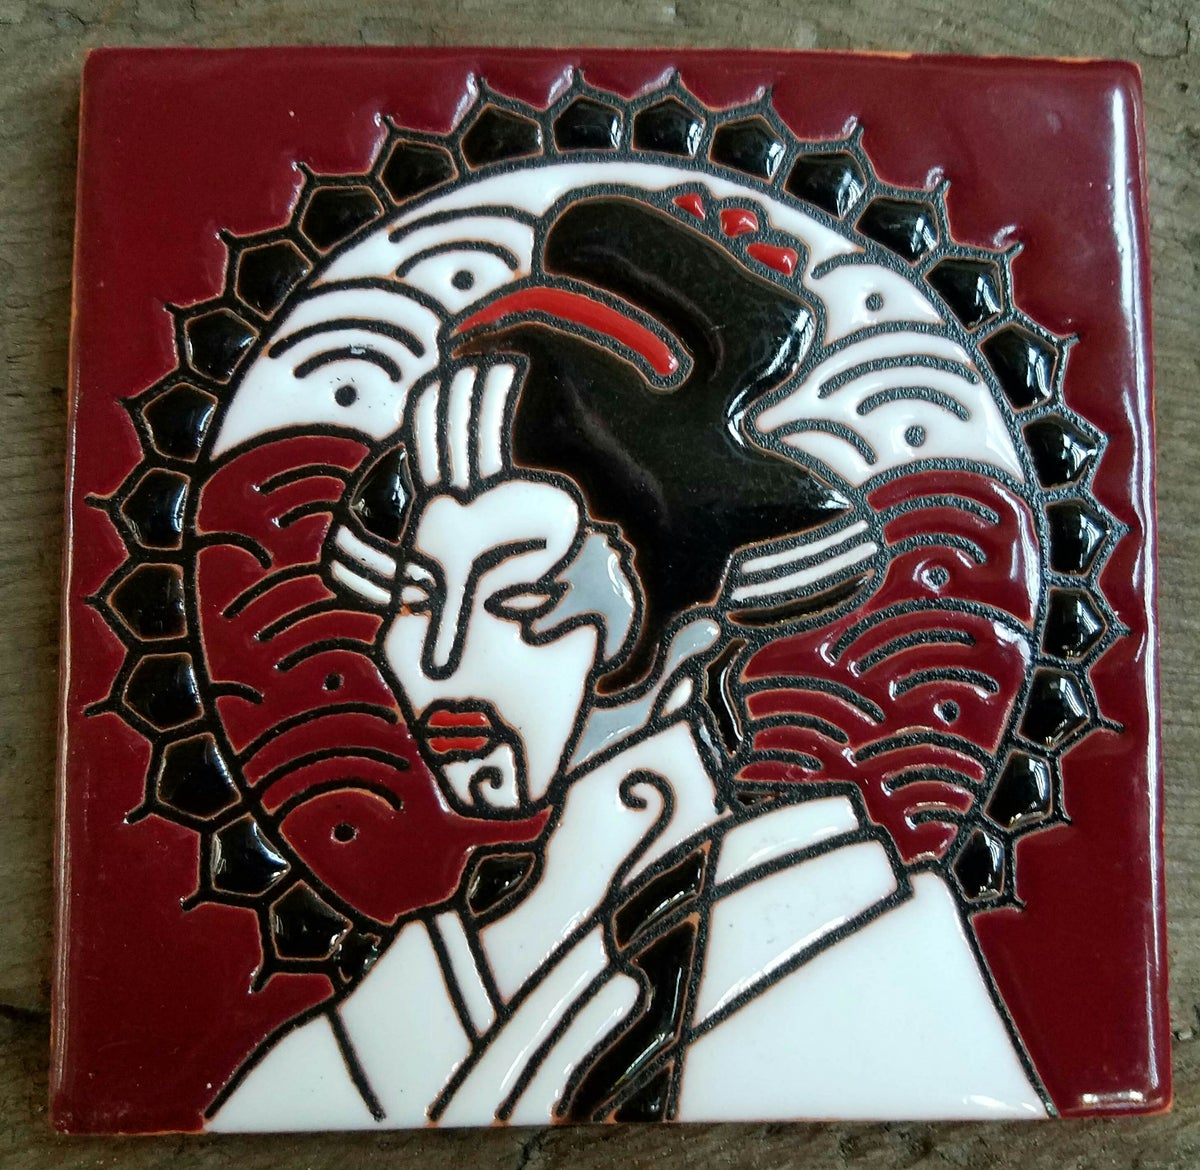 Image of Galactica Ganesha Coaster Tile